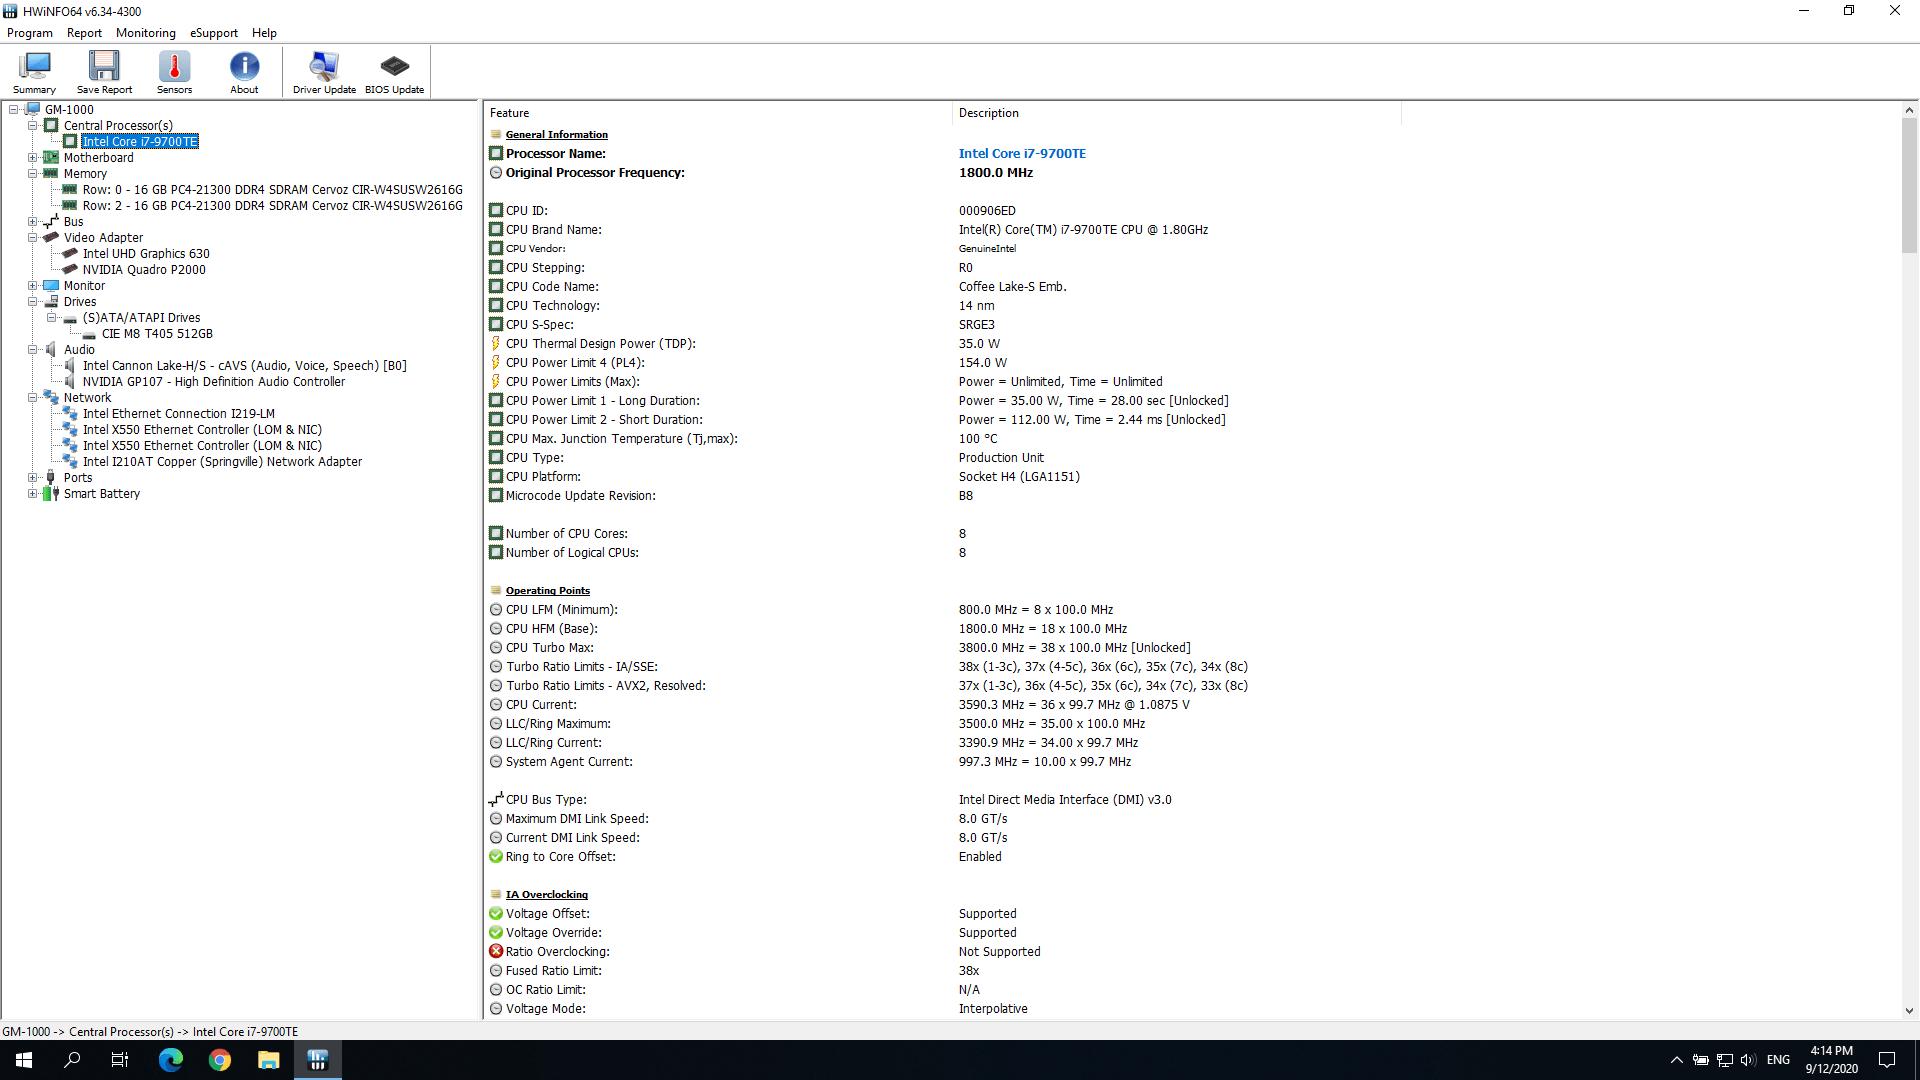 hwinfo64-windows-configuration-details